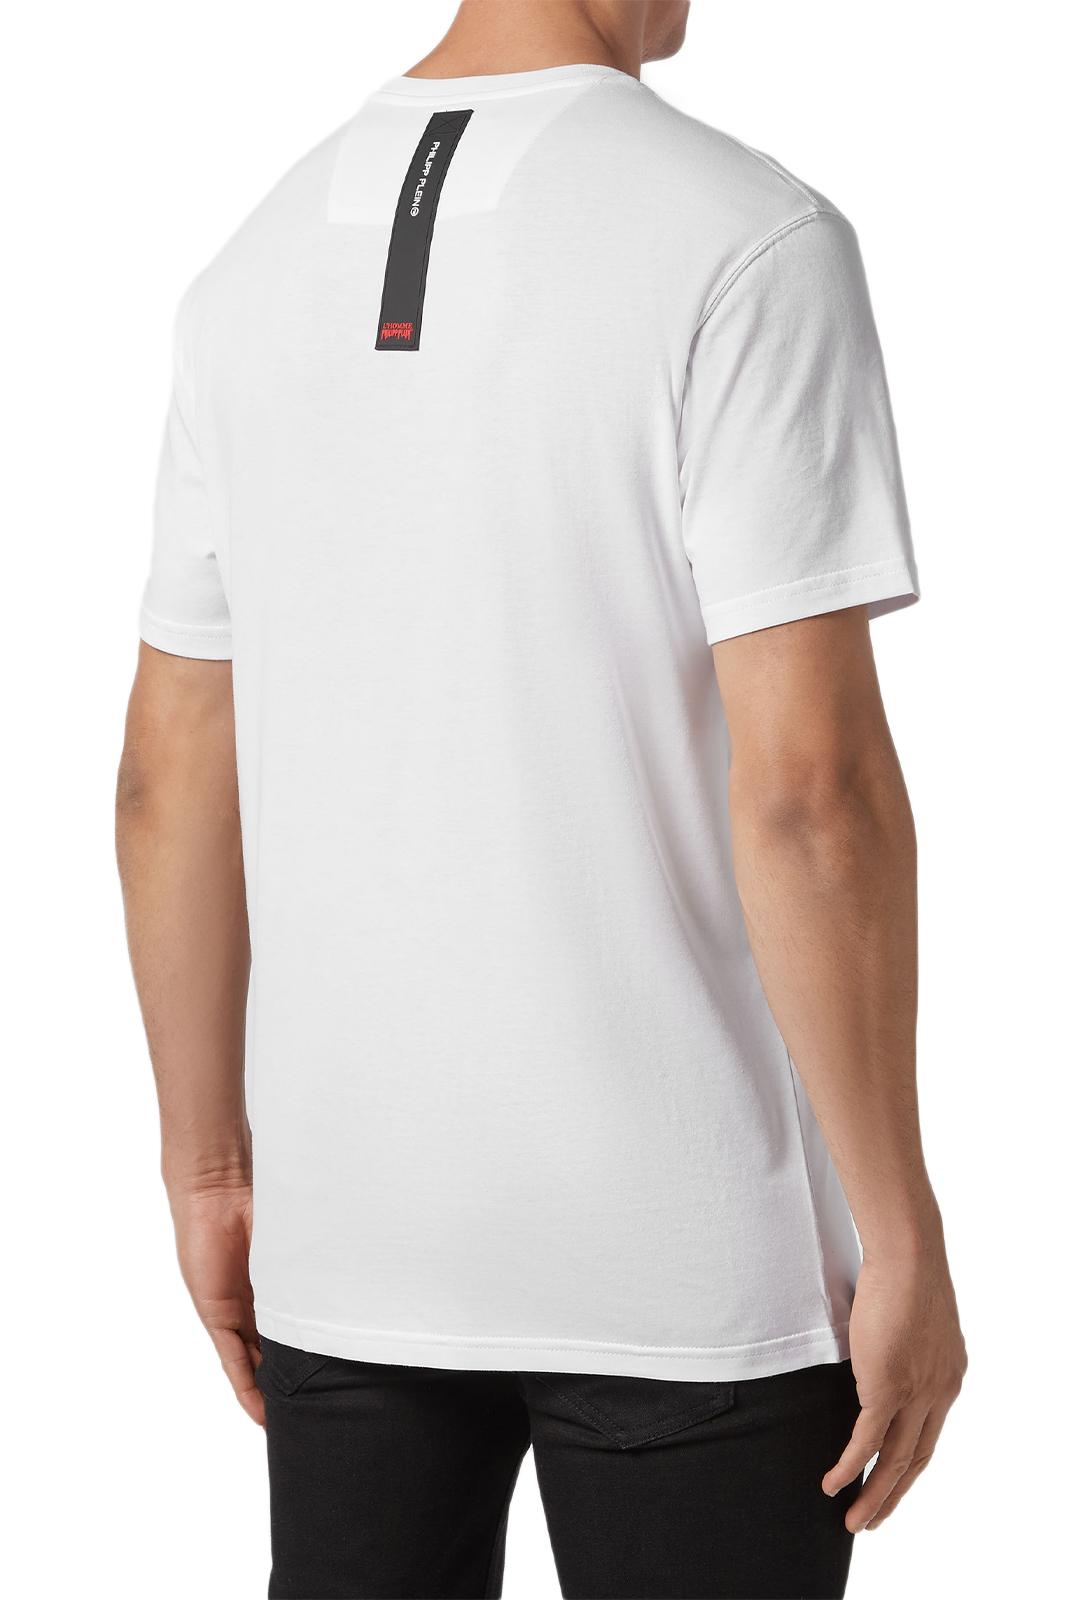 Tee-shirts  Philipp plein MTK3070 Platinum Cut Round Neck Aloha Plein WHITE